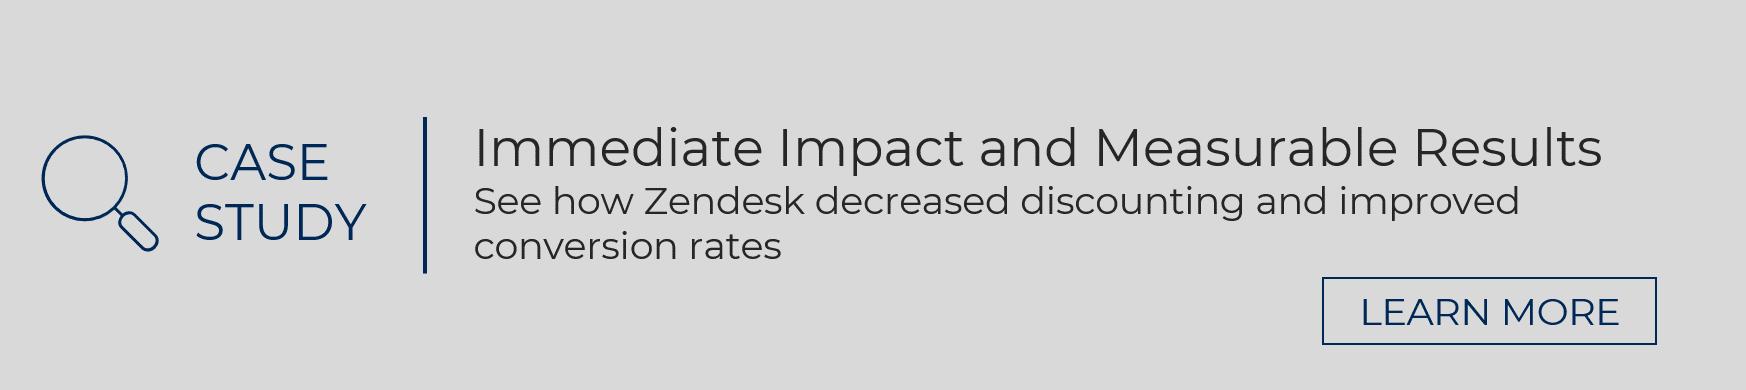 Zendesk Case Study